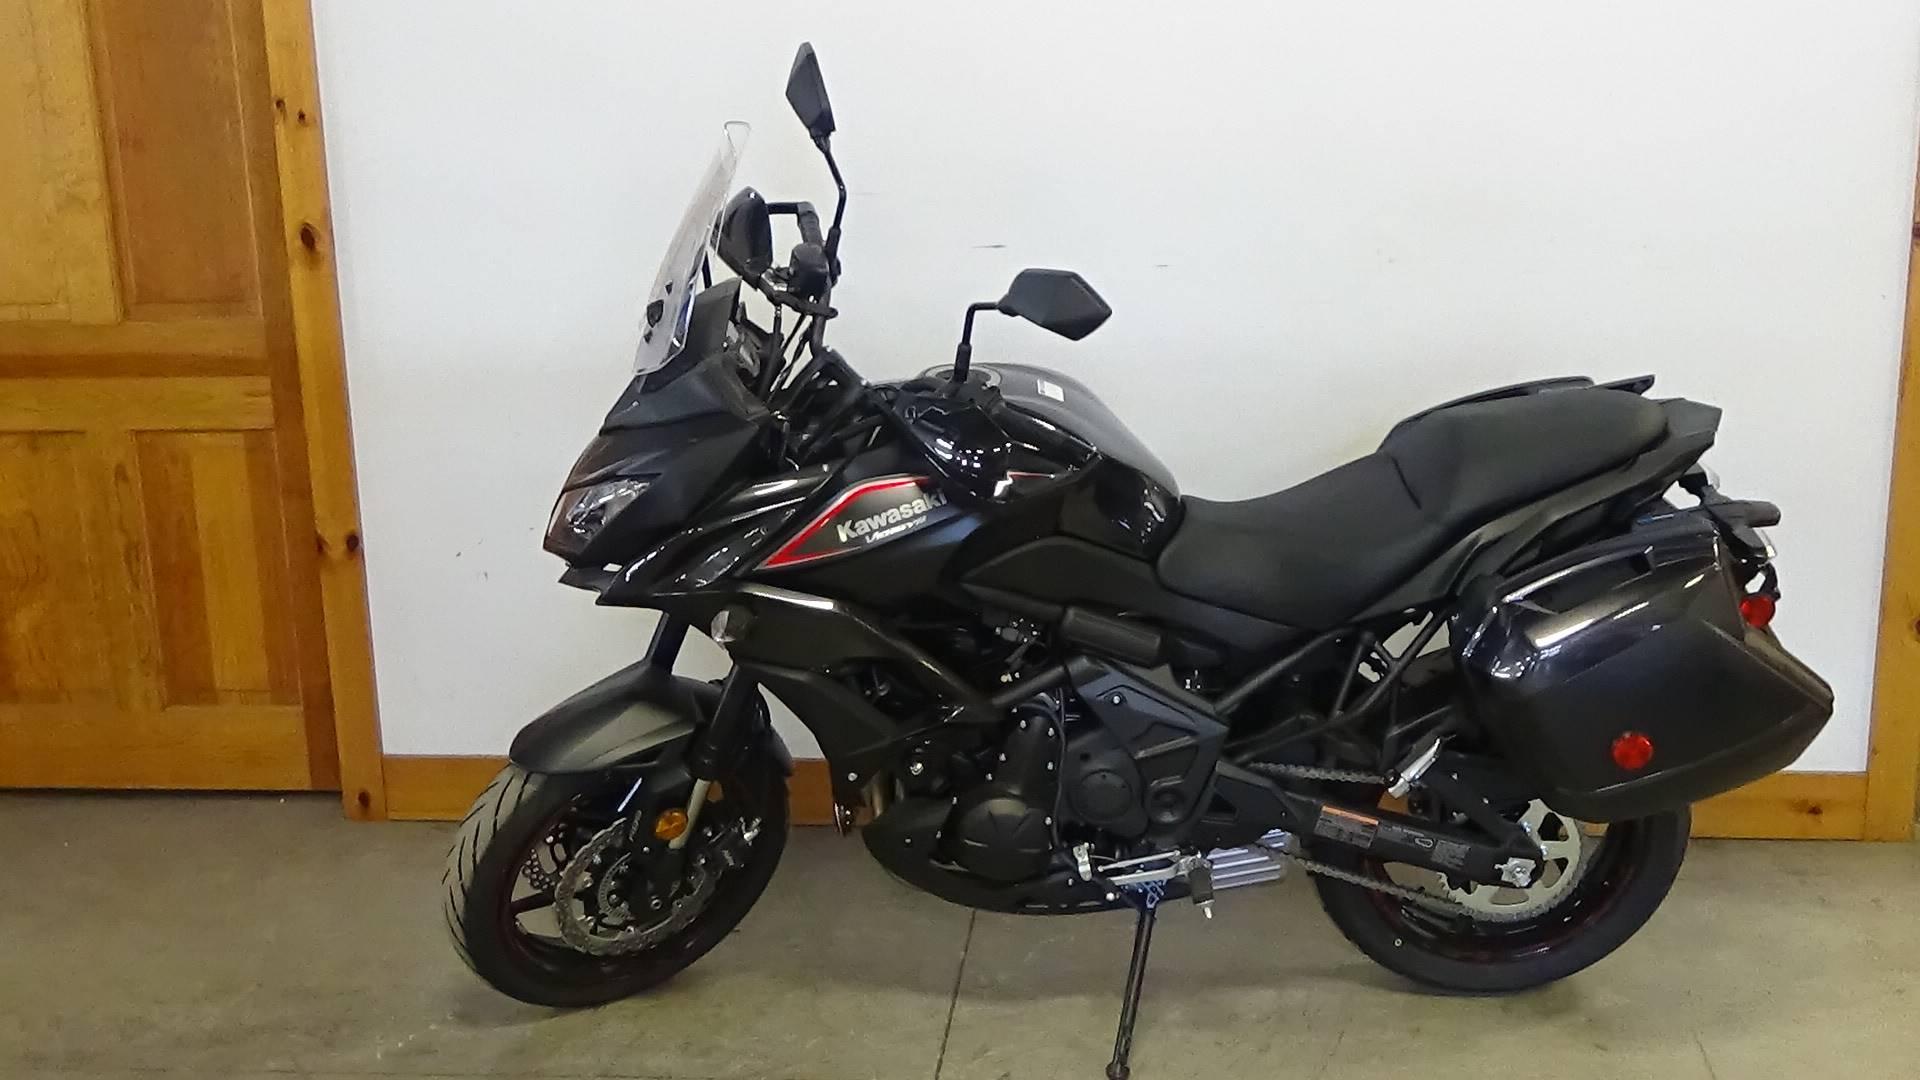 New 2018 Kawasaki Versys 650 Lt Motorcycles In Adams Ma